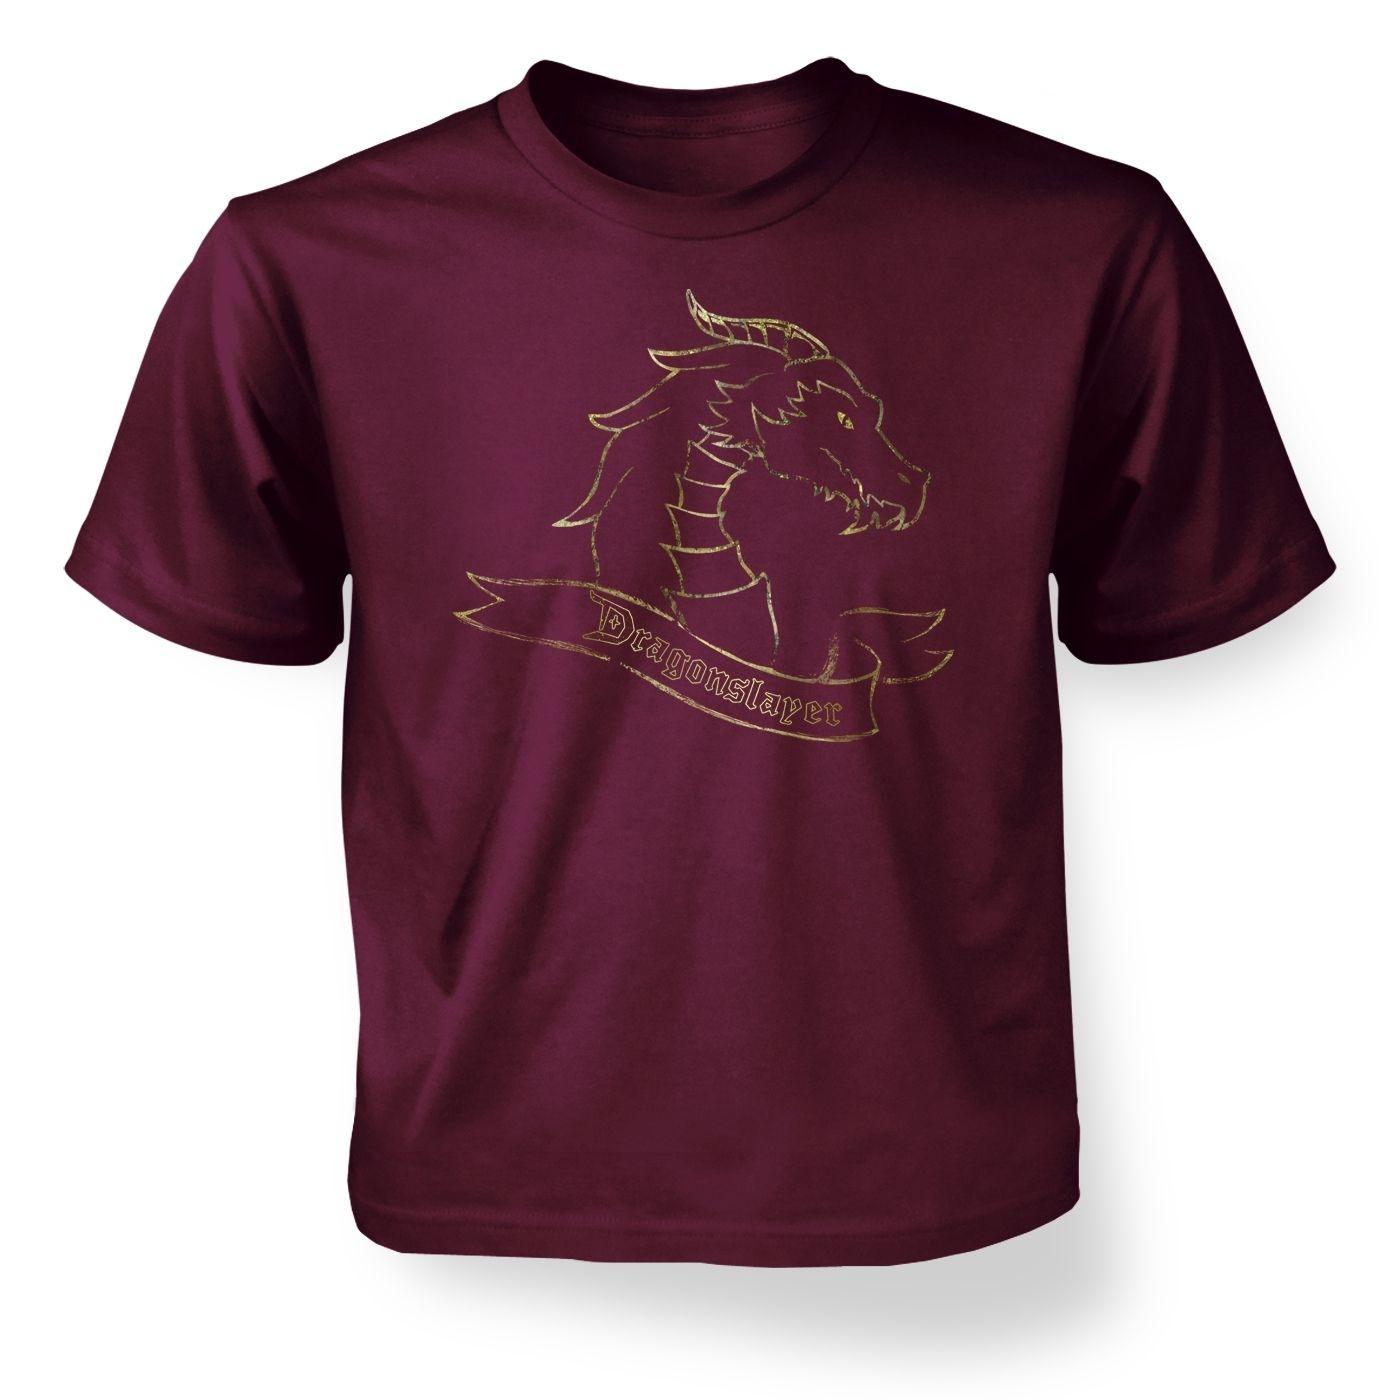 Gold Dragonslayer kids' t-shirt